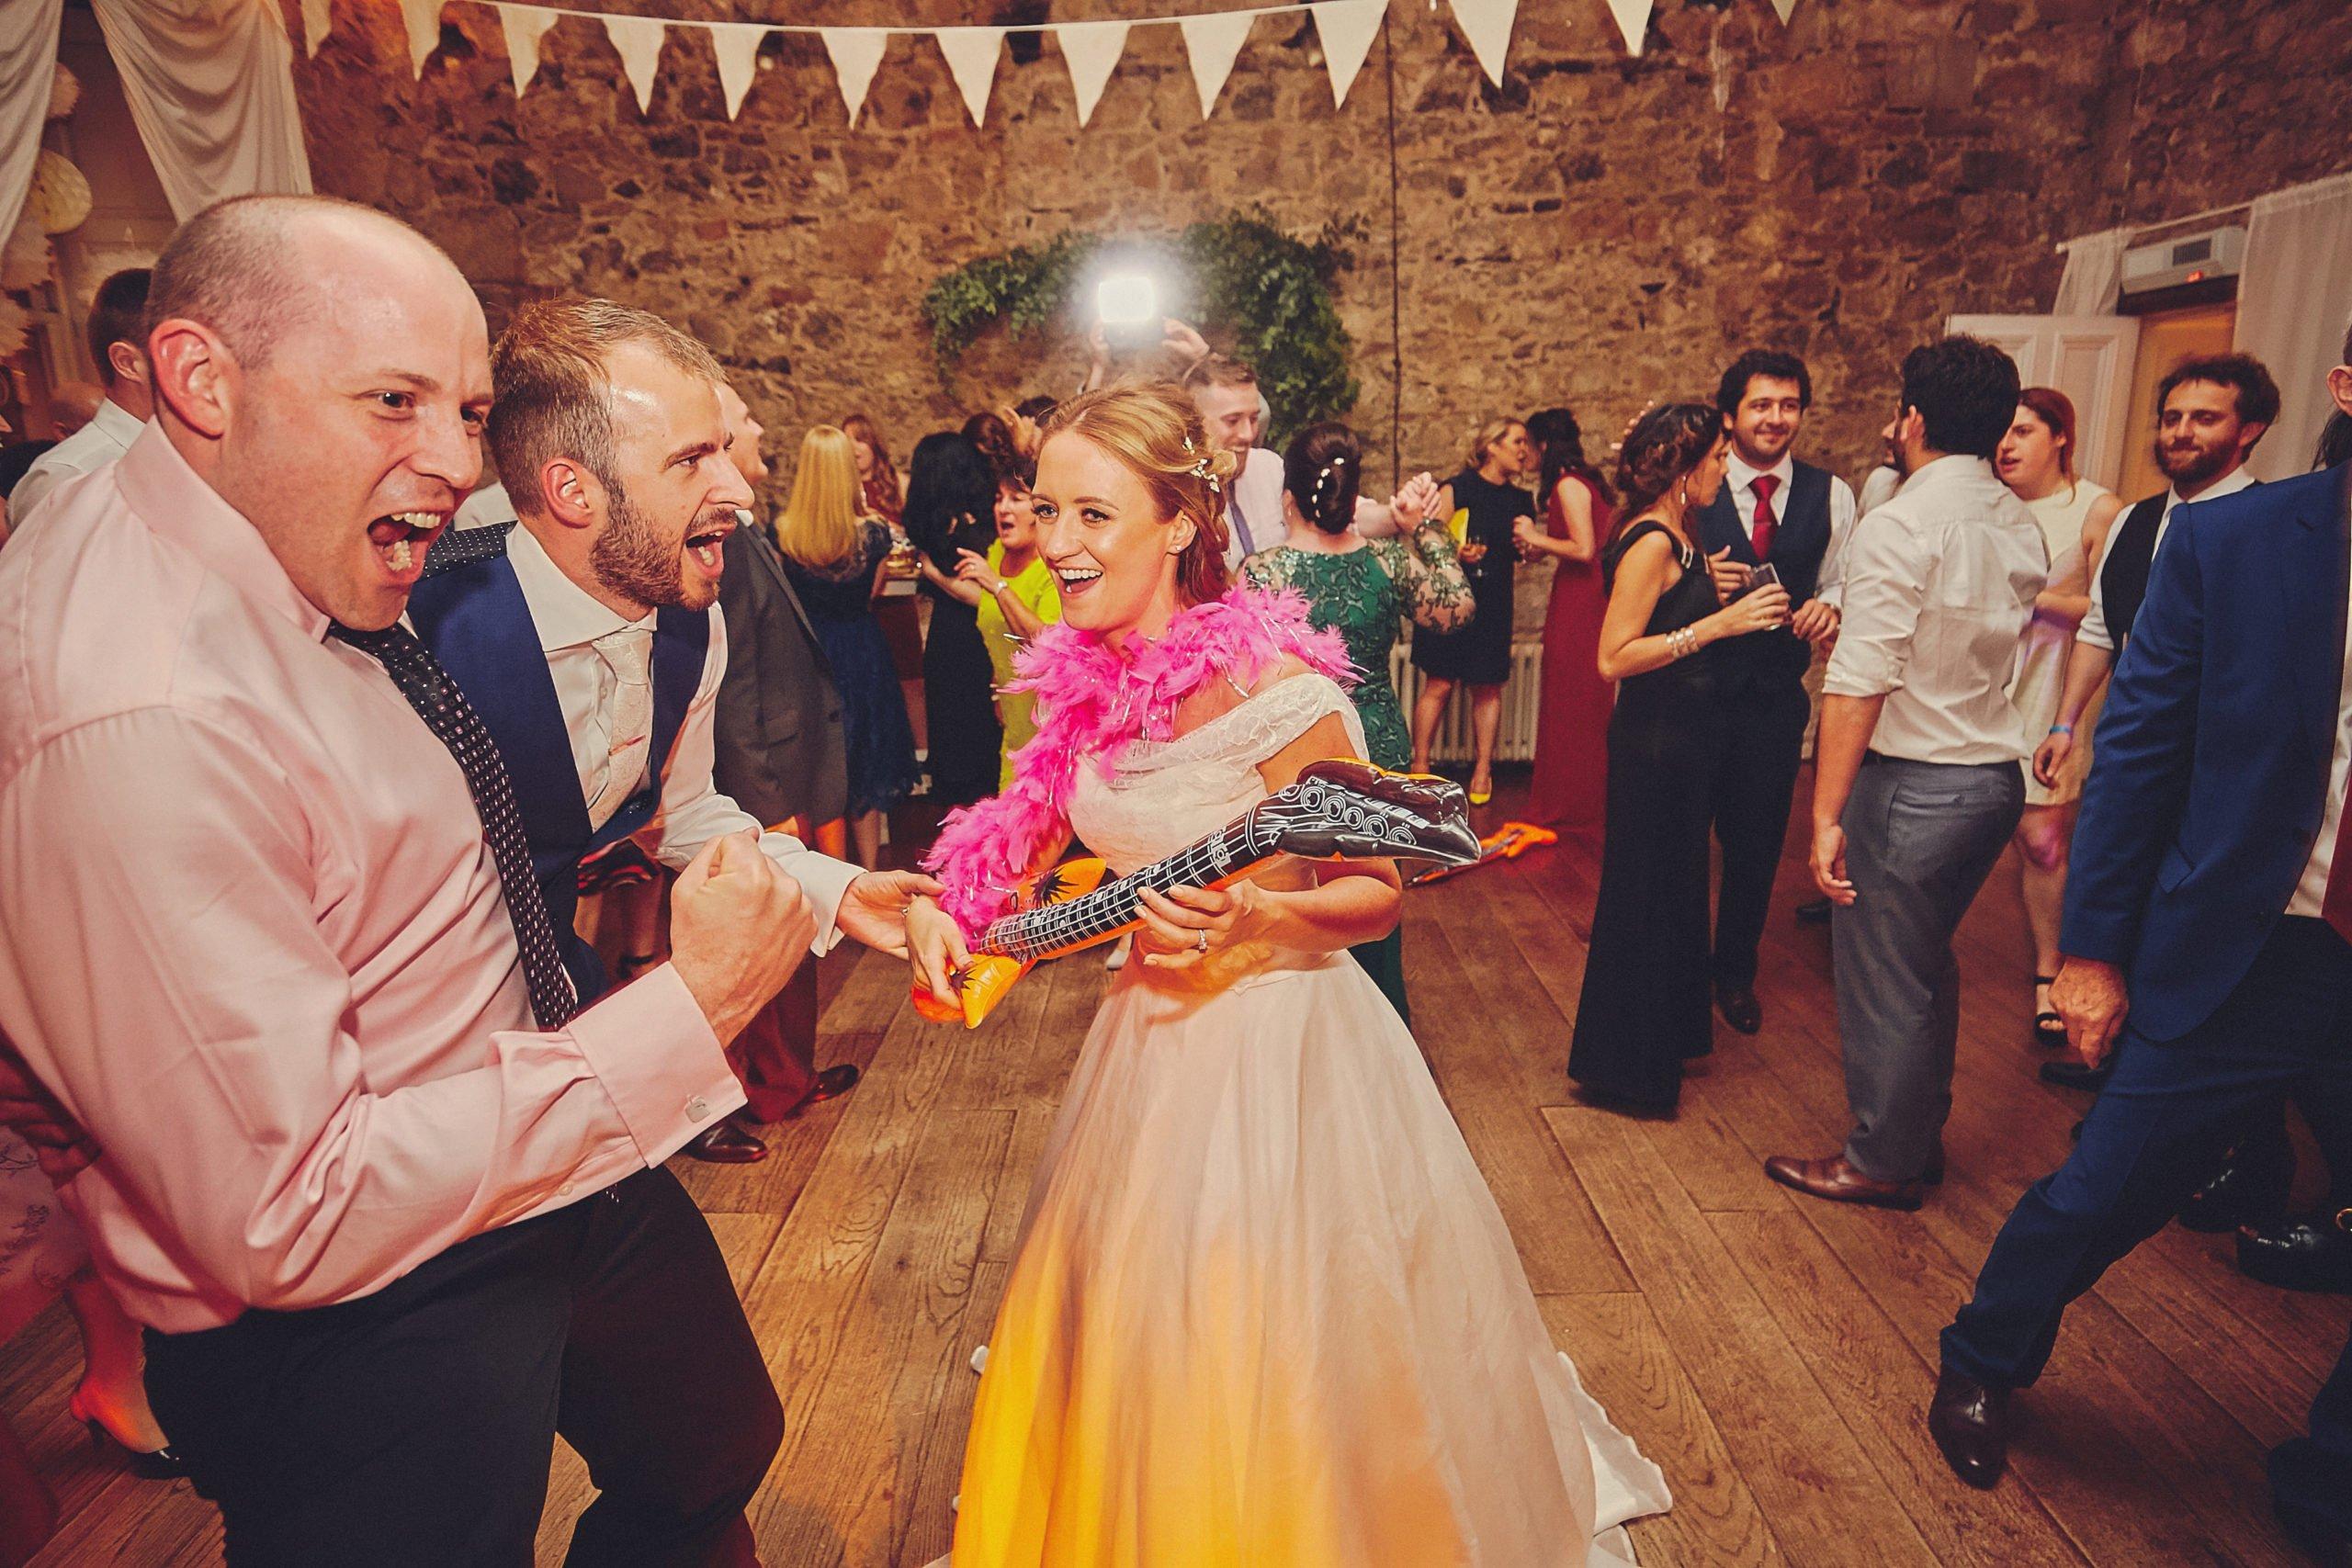 Cloughjordan House Wedding - Alternative Venue 155